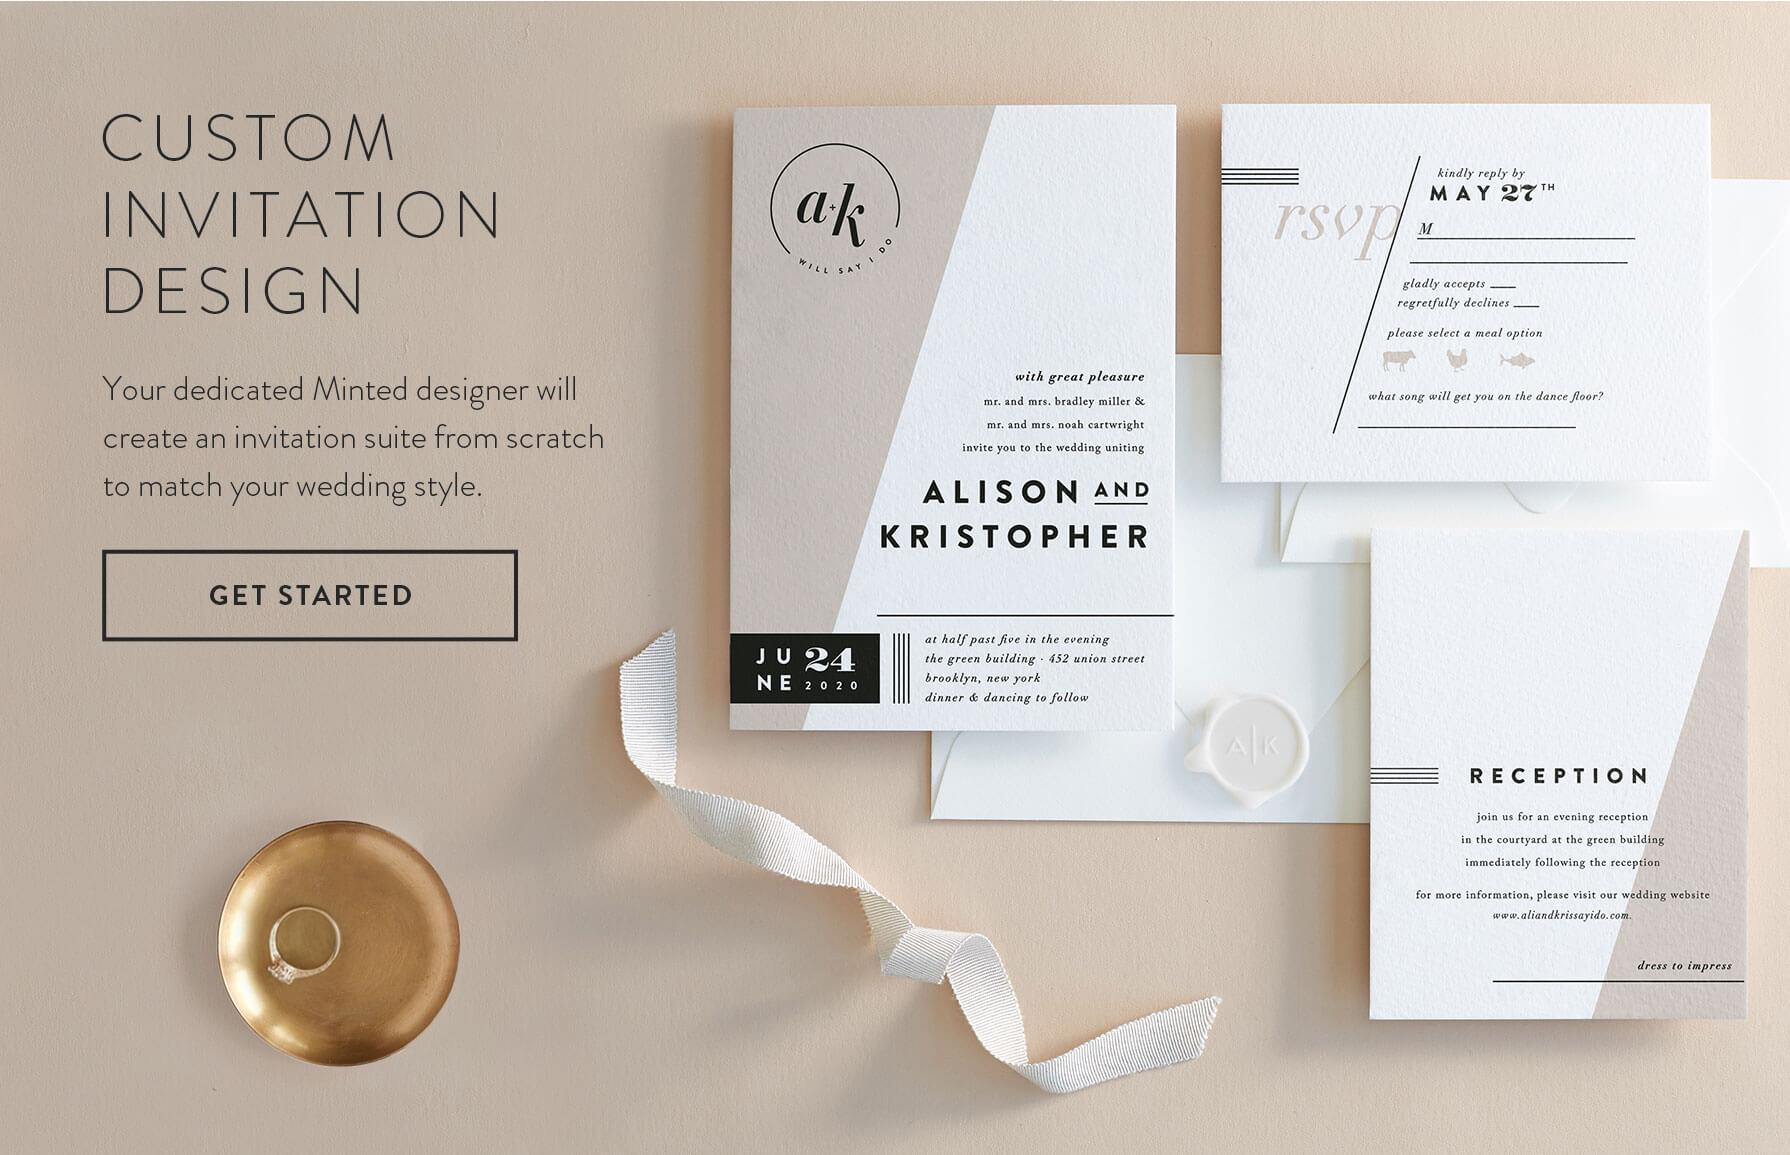 Get Started with Custom Invitation Design